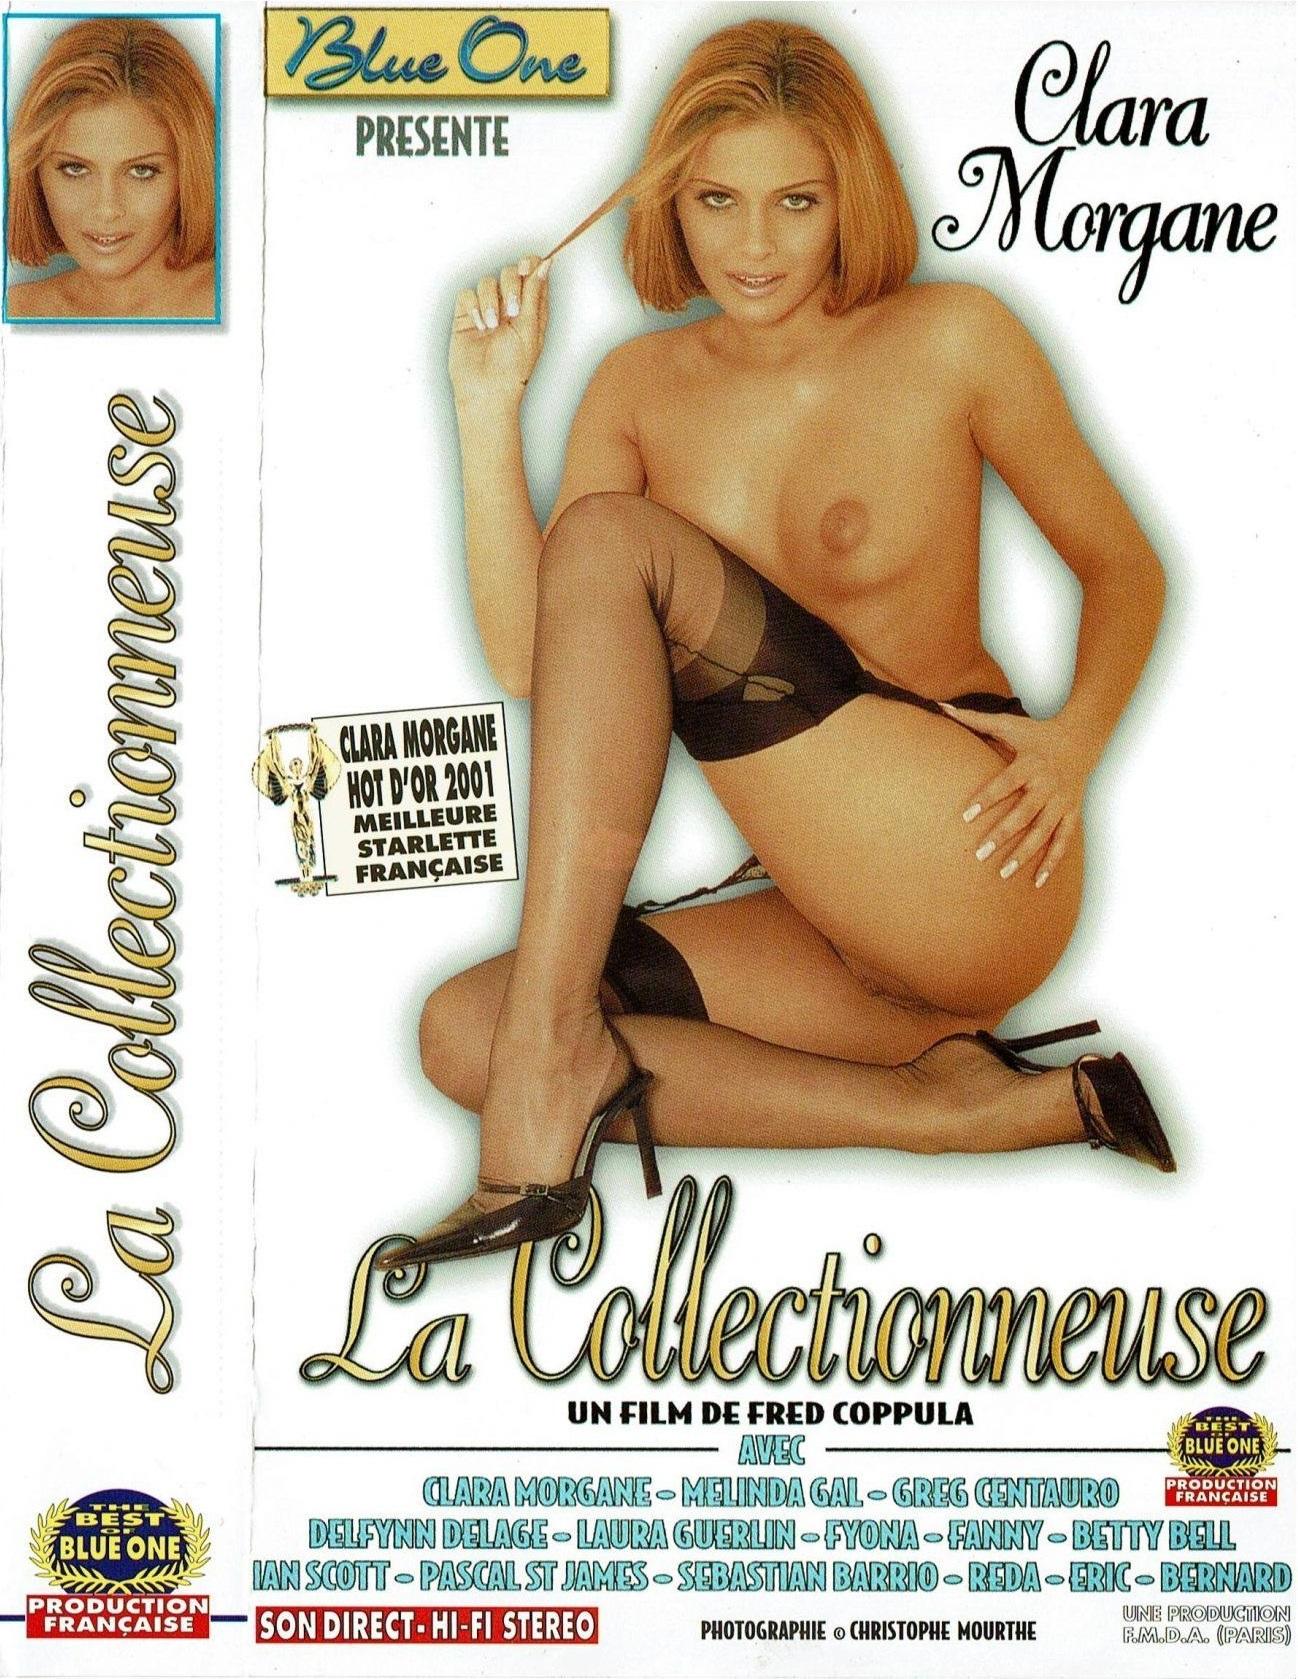 Pochette de La collectionneuse, un film X de 2001 avec Clara Morgane sur VHS Porno